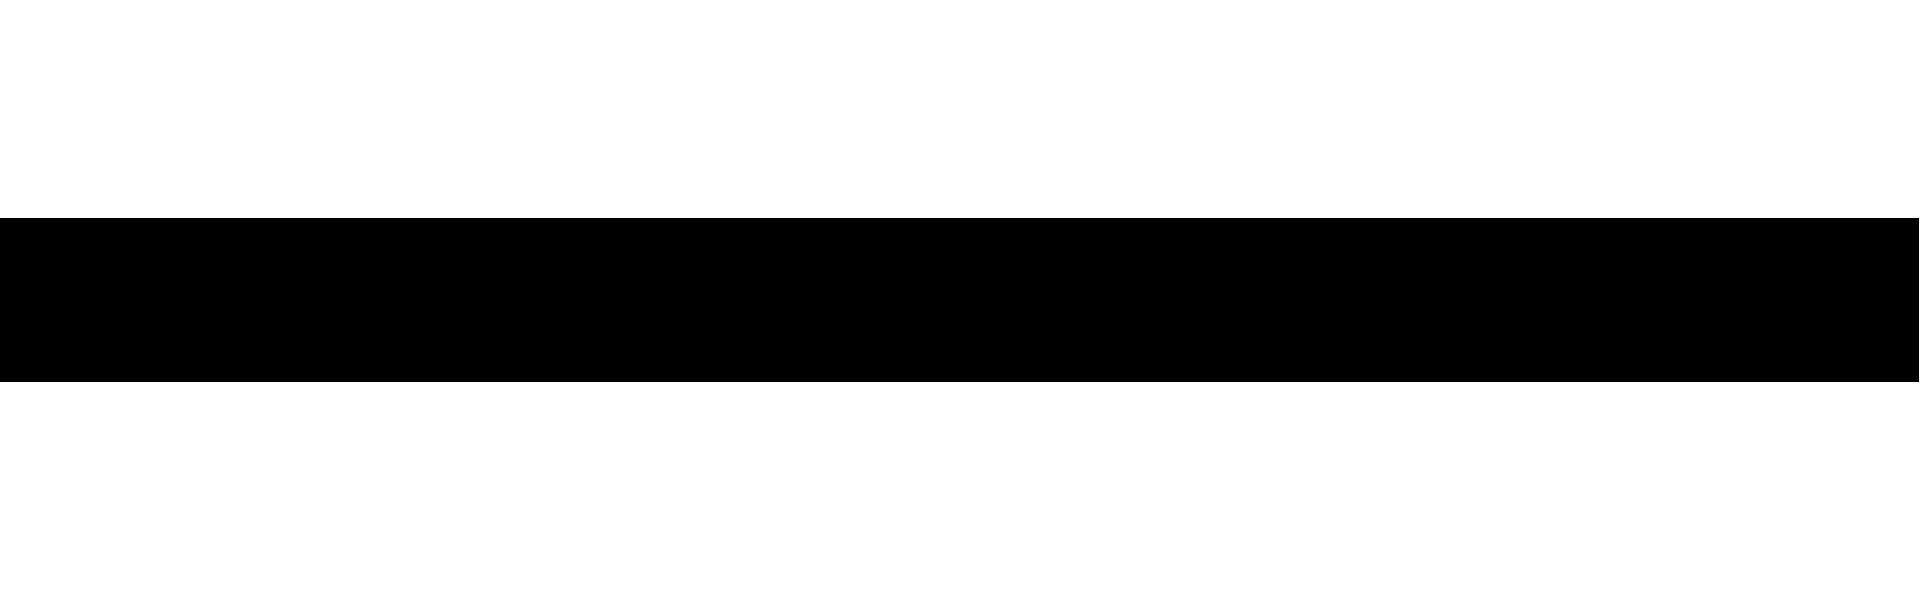 Dreadnought-Logo-Black_Dreadnought_black_solid